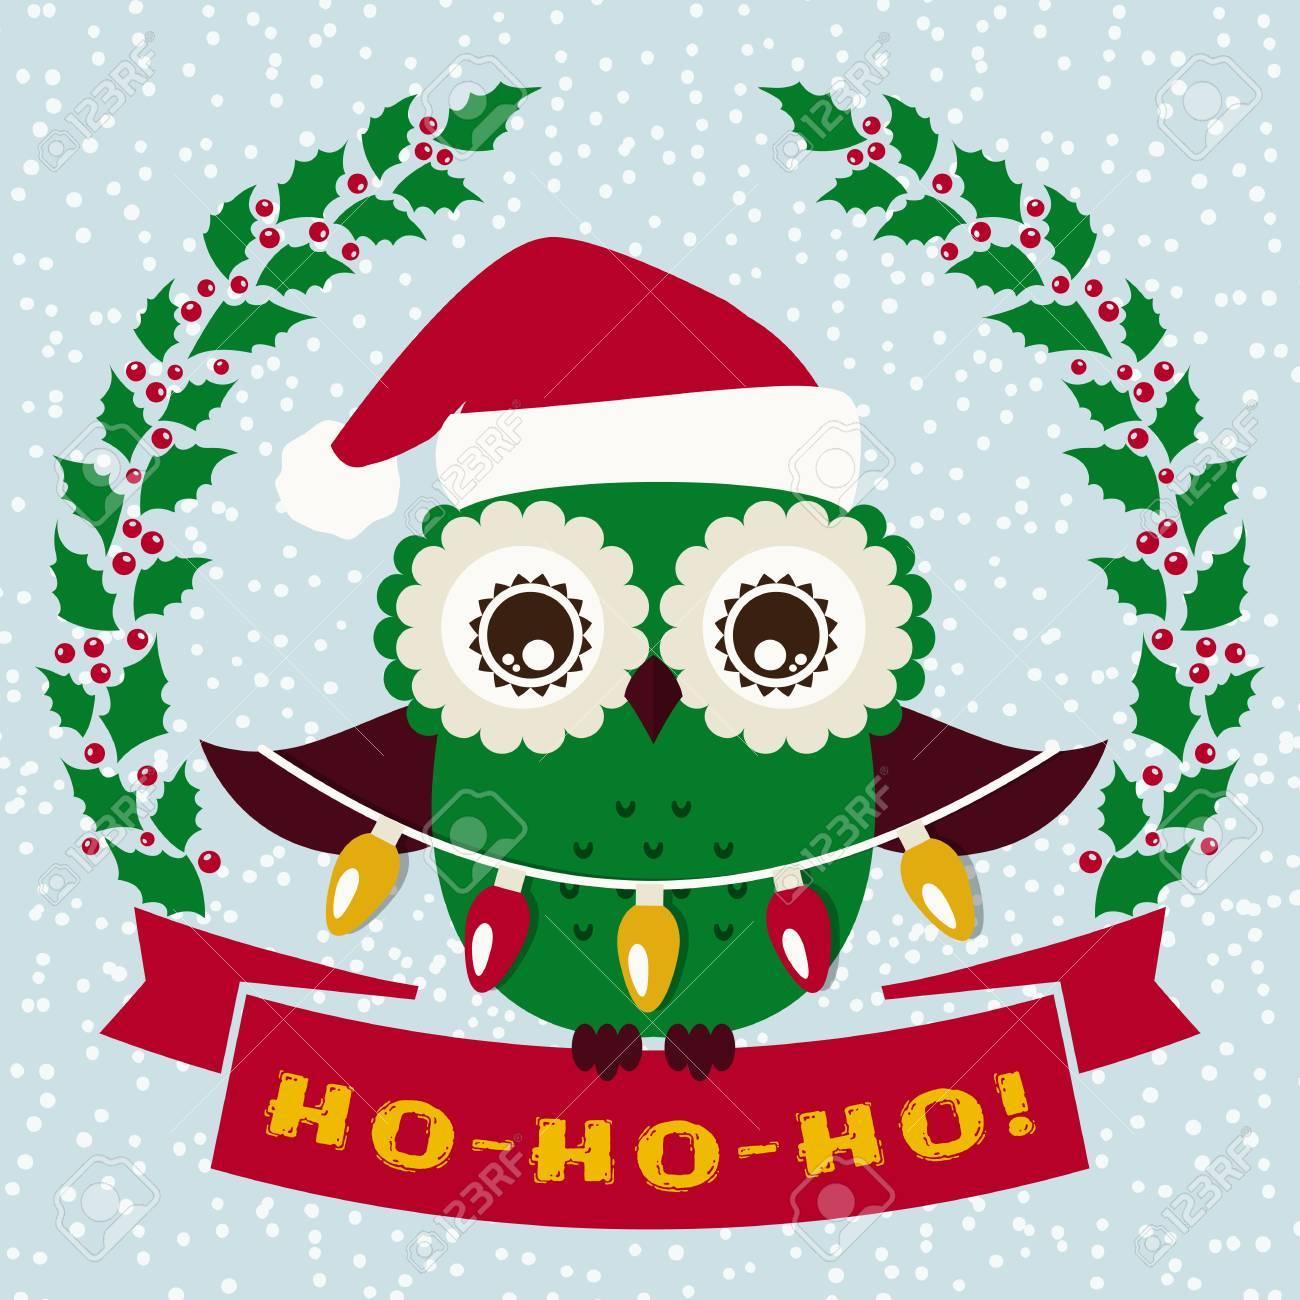 Ho-Ho-Ho! Christmas Greeting Card With Cute Owl In Santa Hat ...